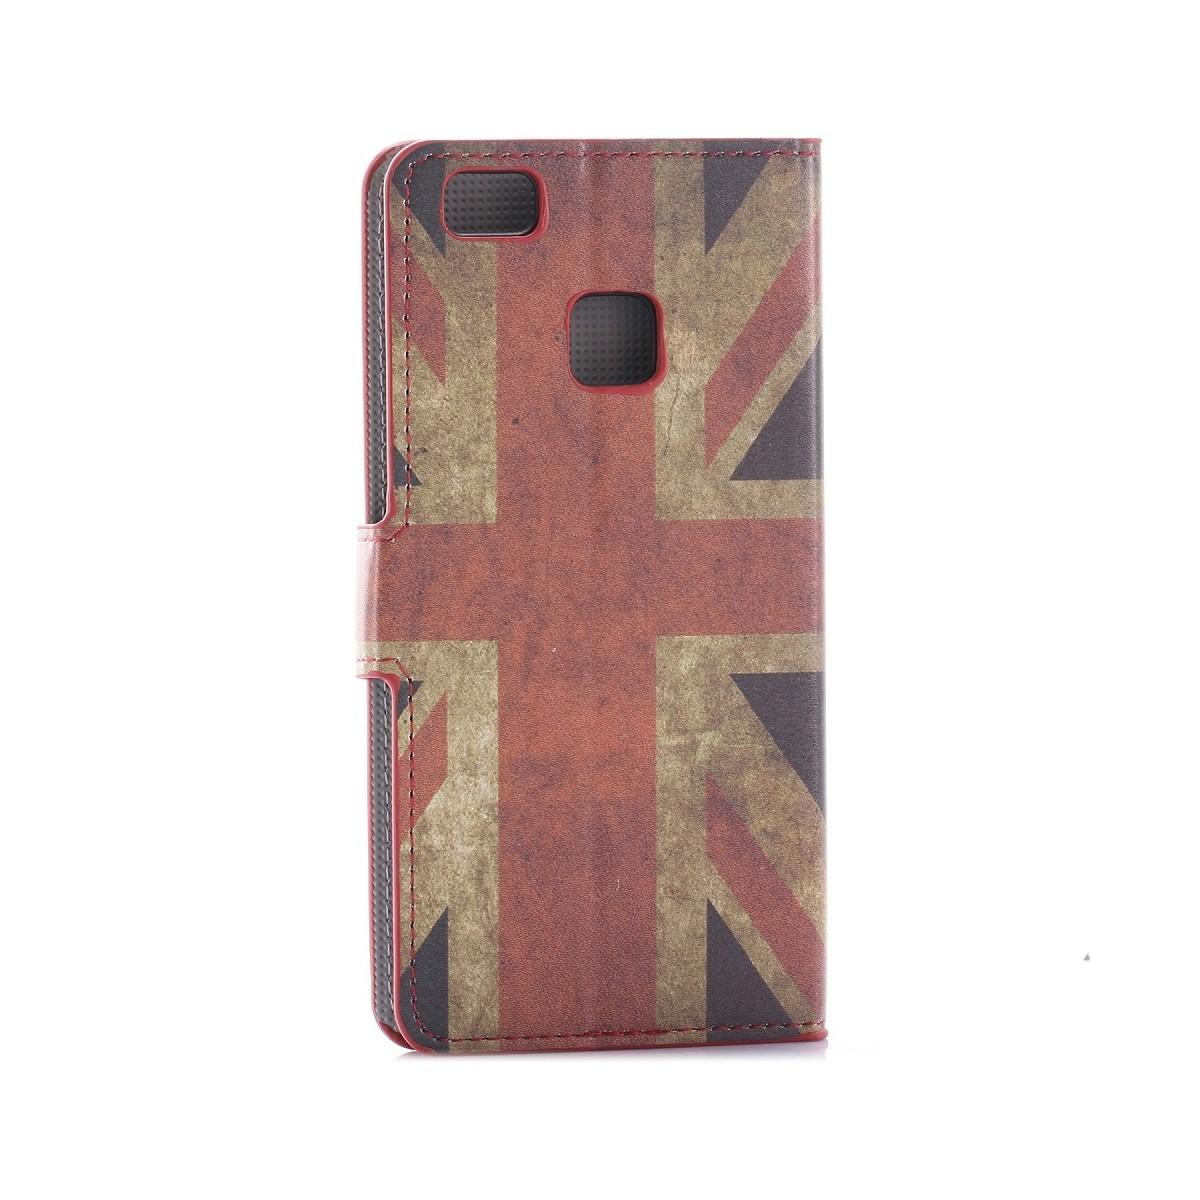 Etui Huawei P9 Lite motif Drapeau UK - Crazy Kase